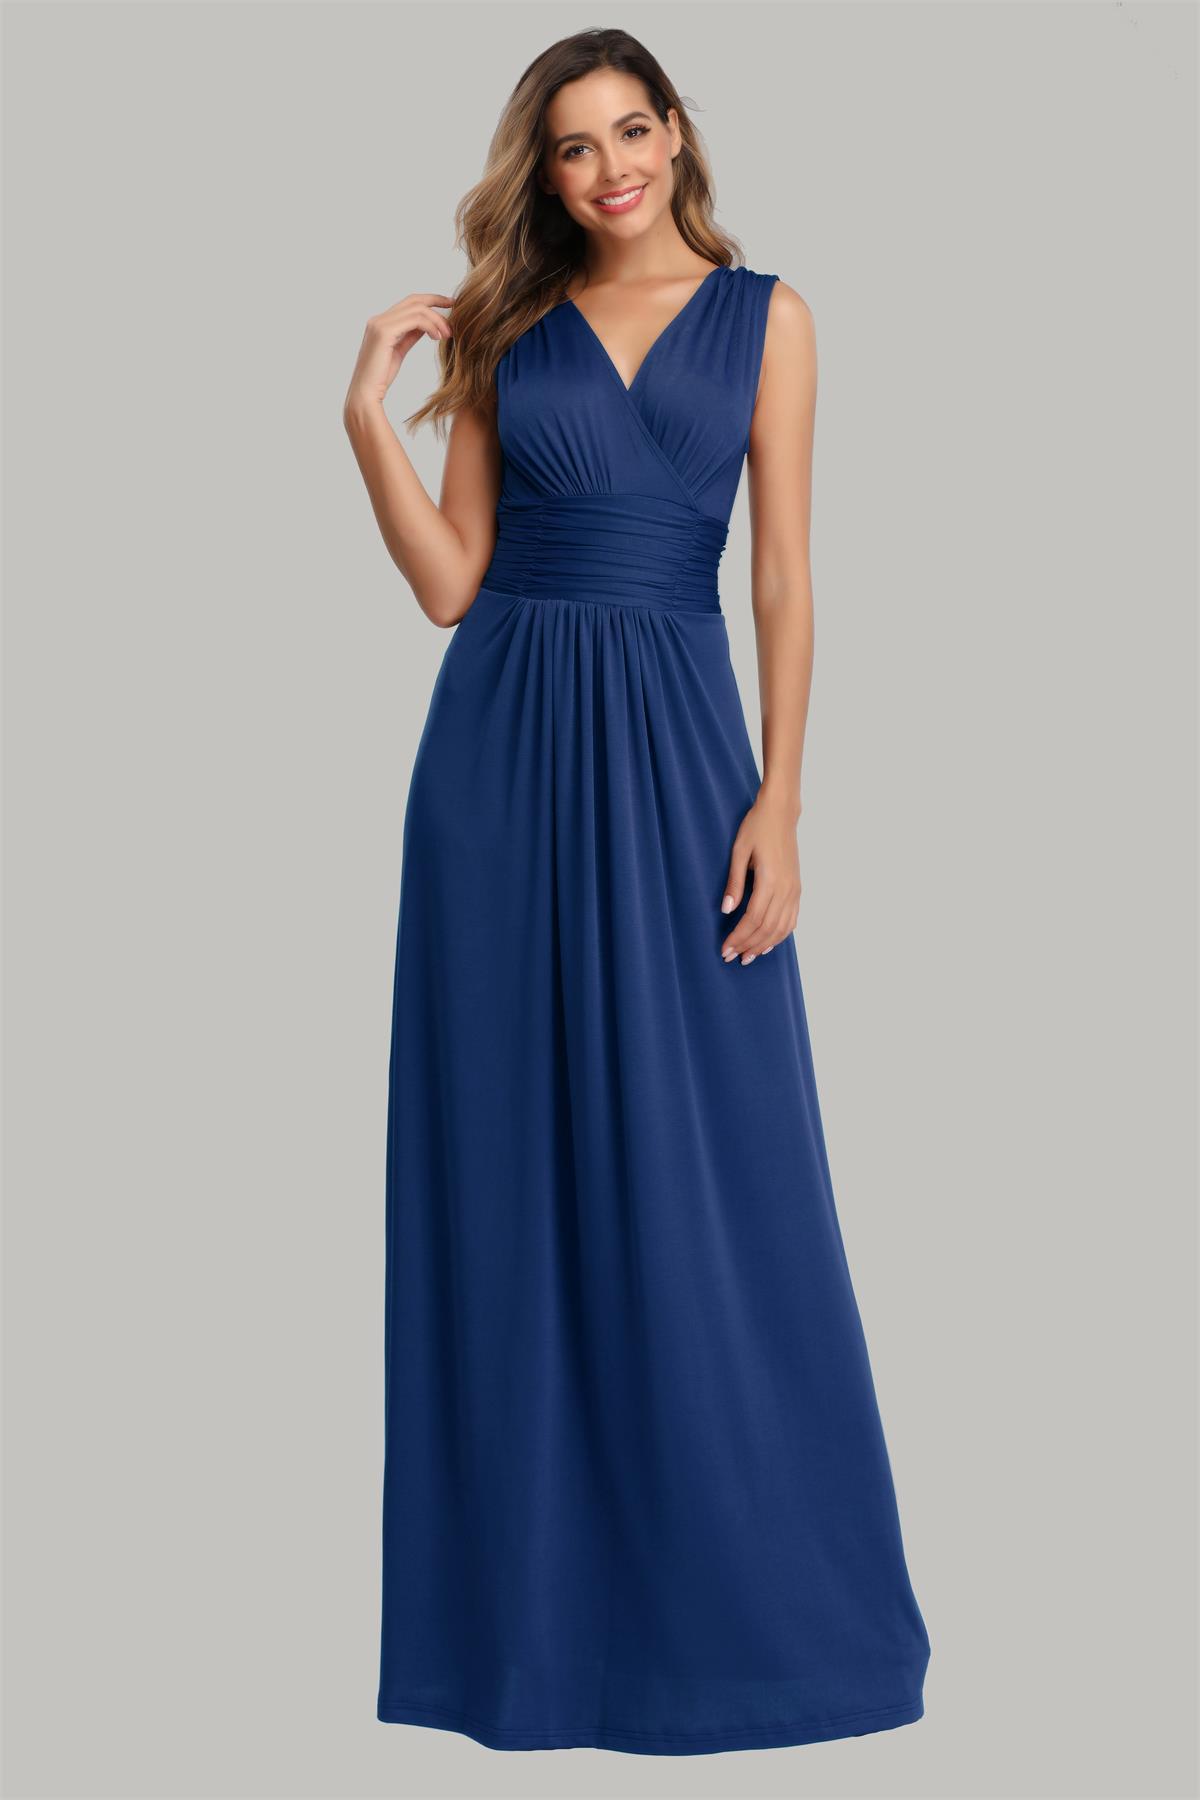 robe soirée longue bleu roi cache coeur pour mariage